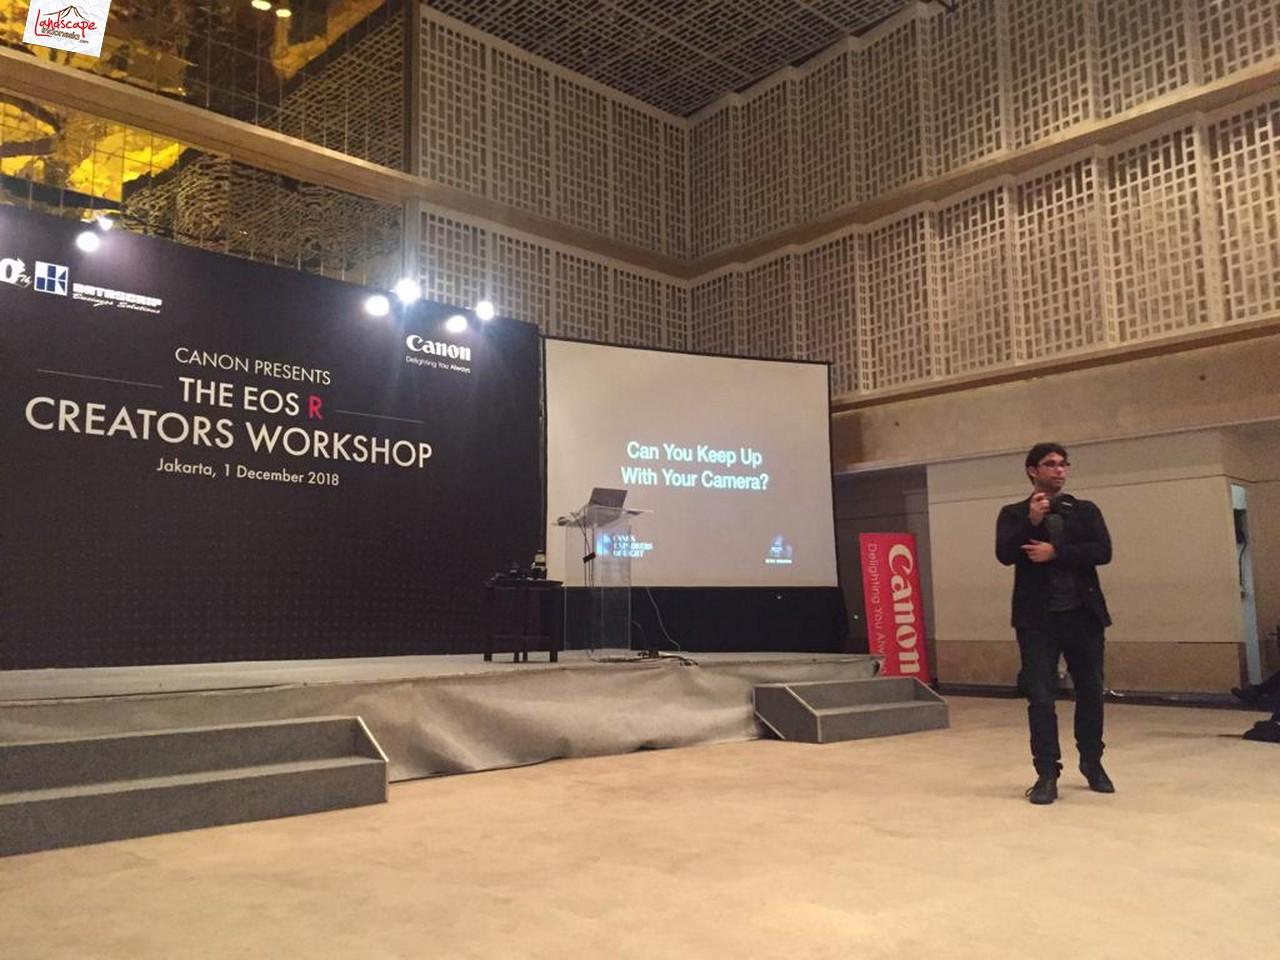 eos r creators workshop 9 - EOS R Creators Workshop